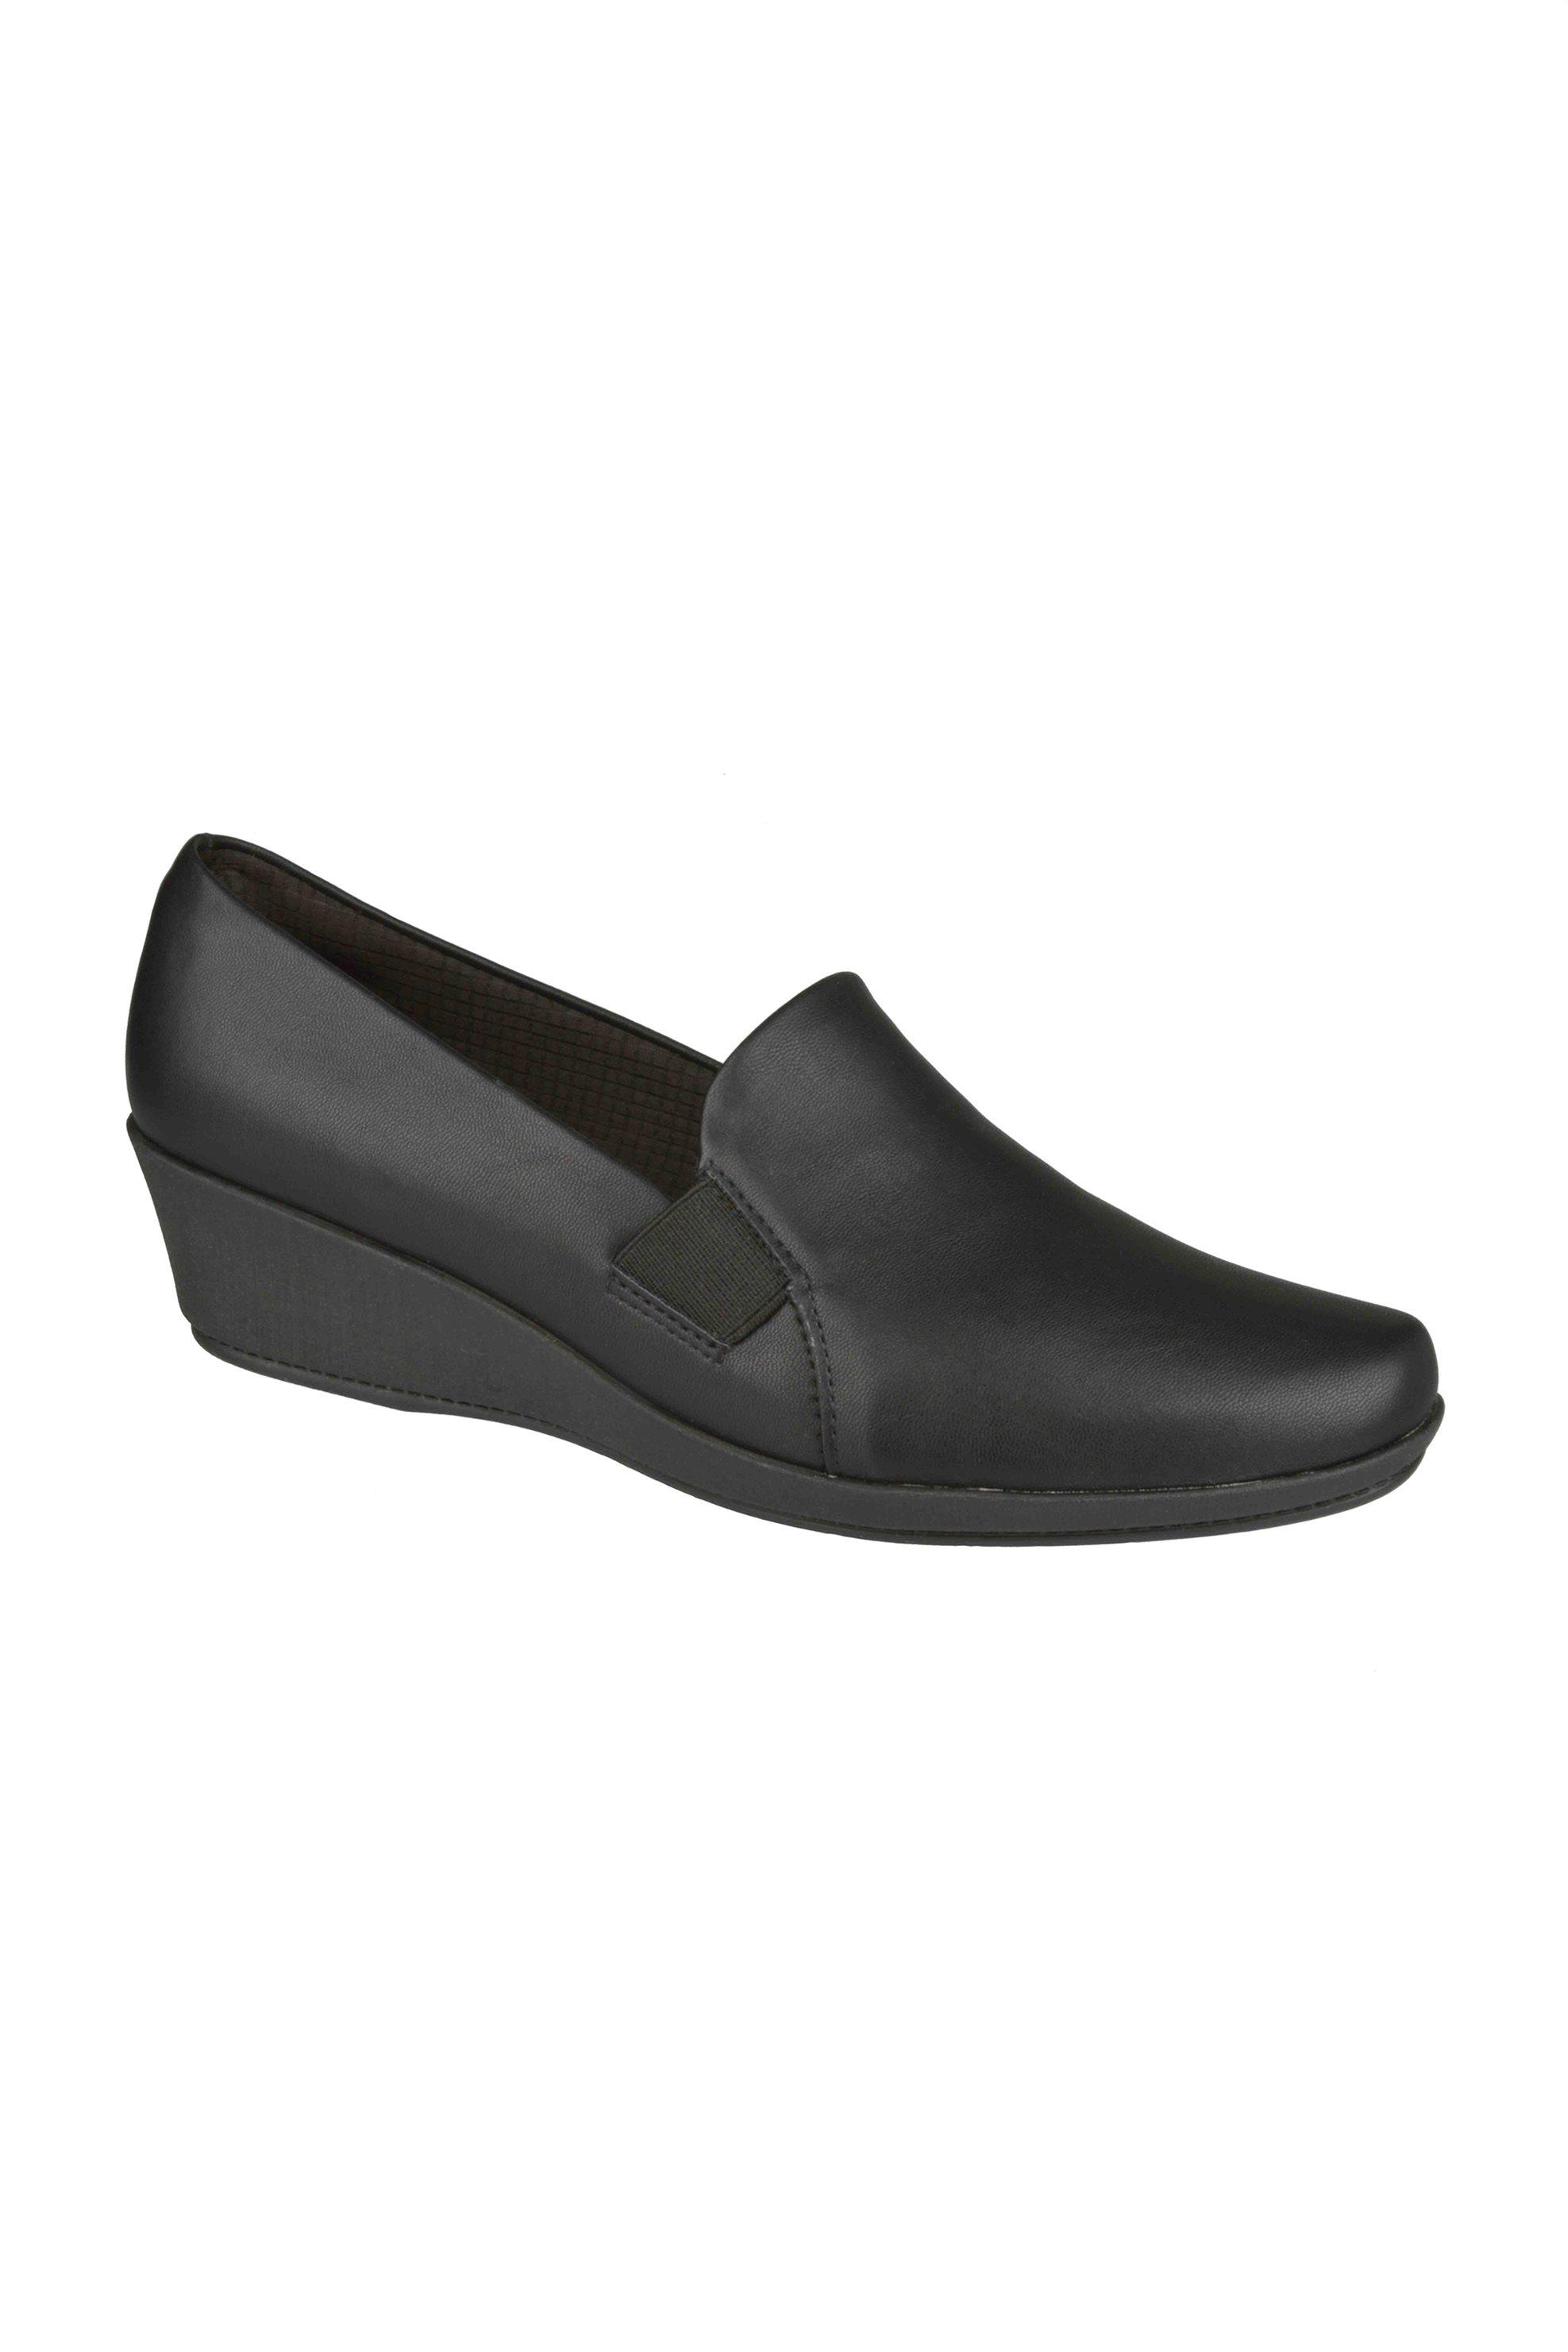 Piccadilly γυναικεία ανατομικά loafers με λάστιχο – 14313700000039 – Μαύρο